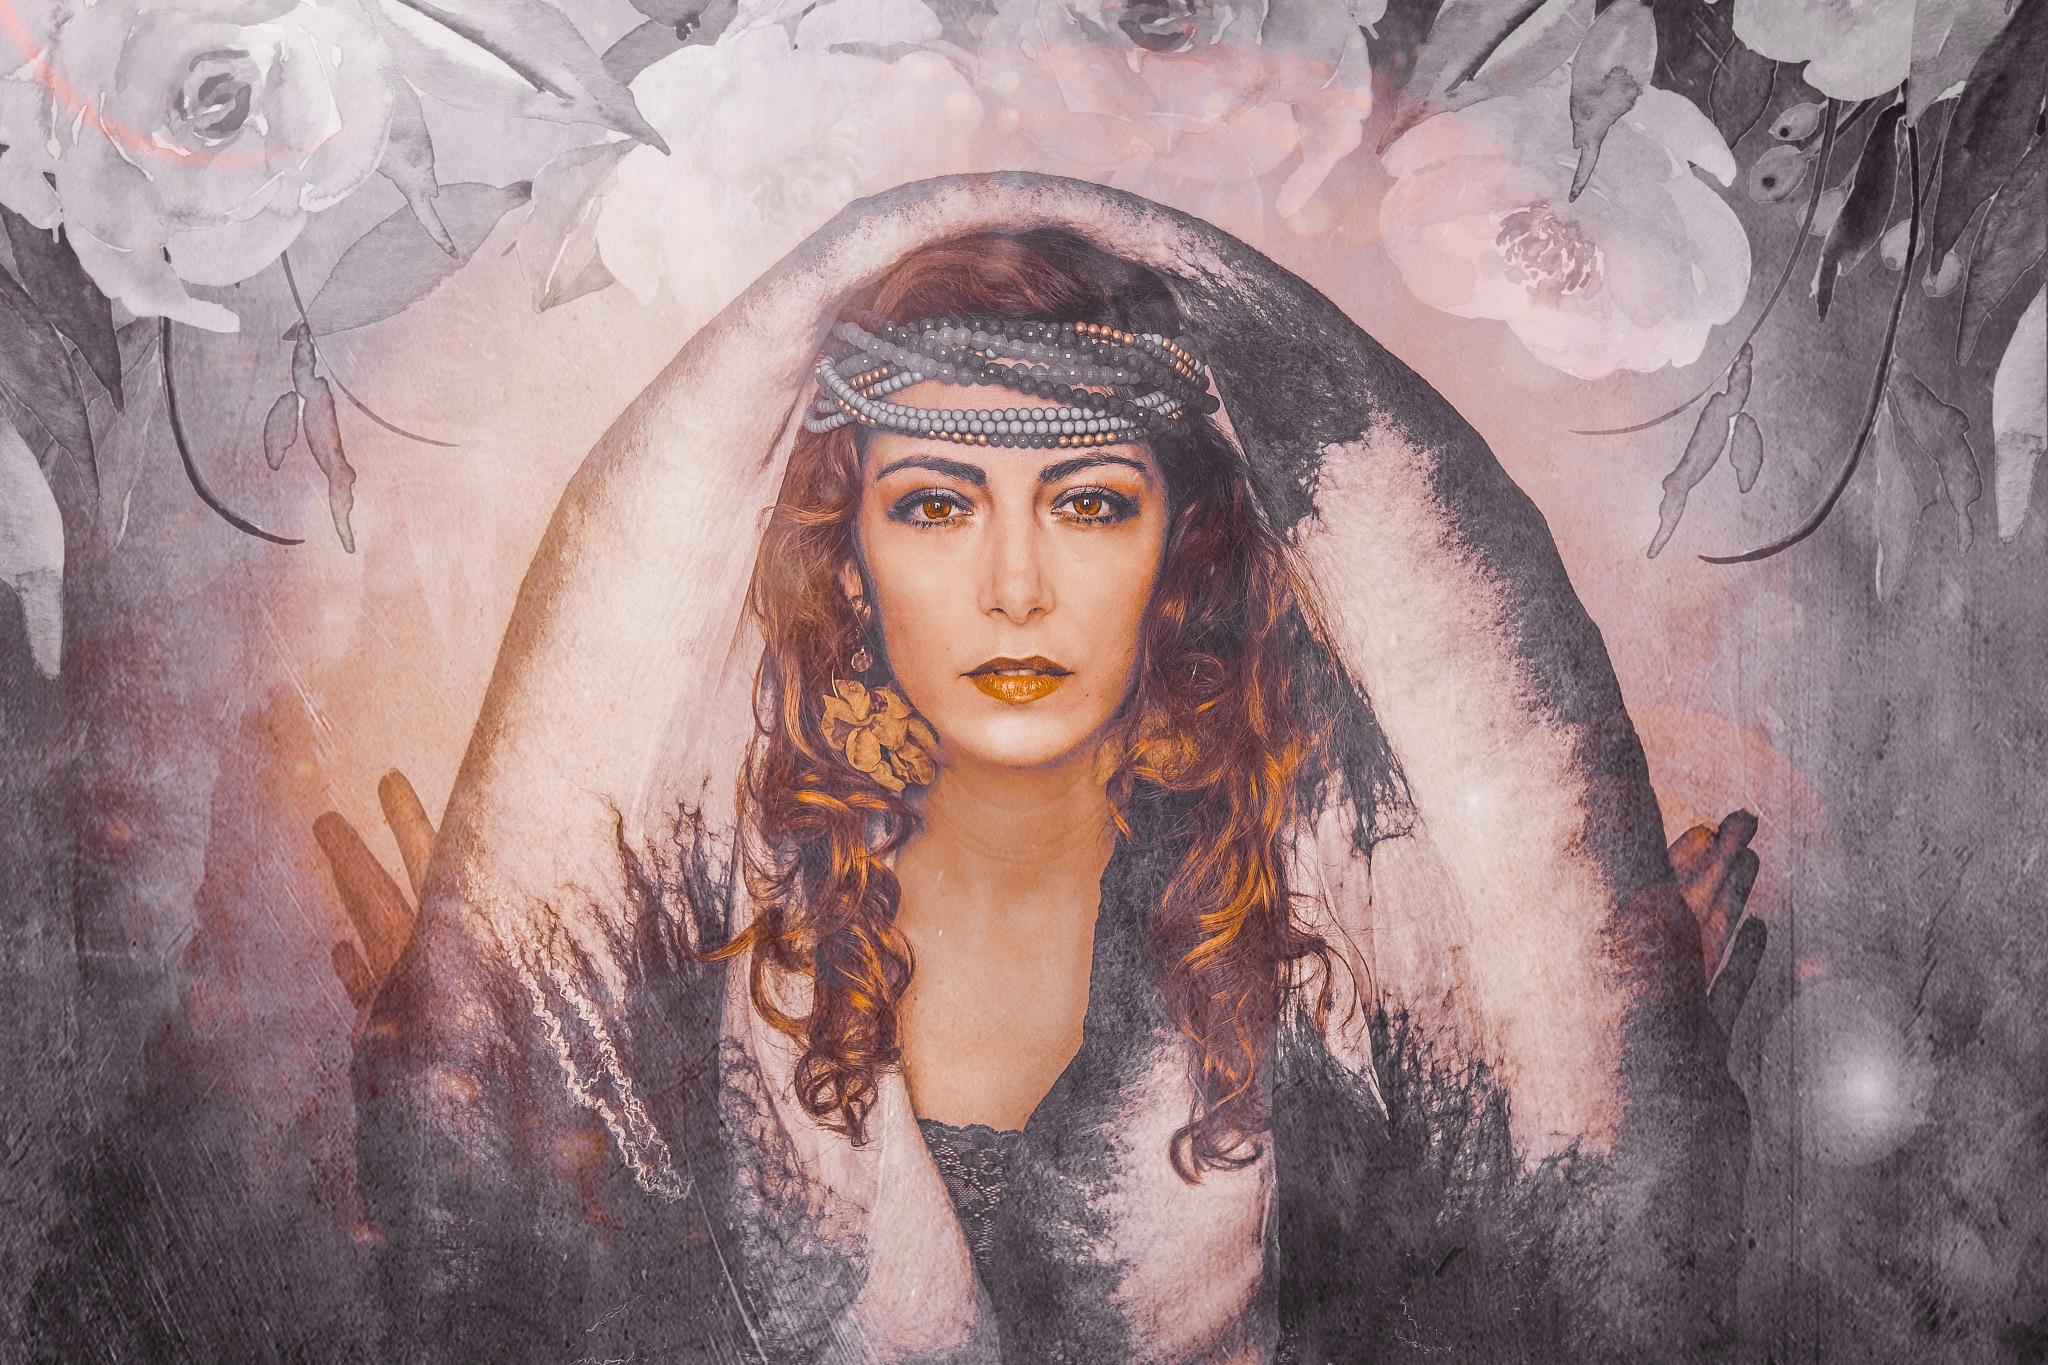 Transition by Monica Garcia Moran